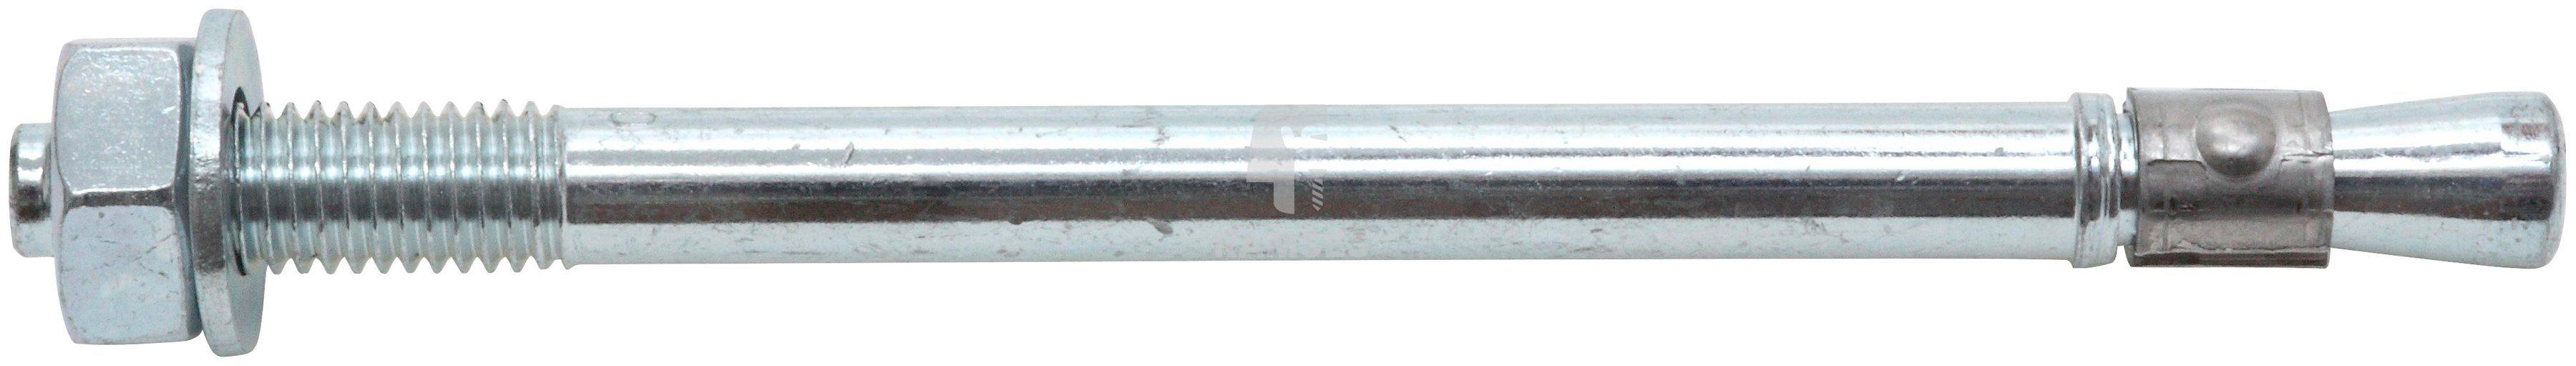 RAMSES Dübel , Bolzenanker B M12 x 240 mm, 10 Stück